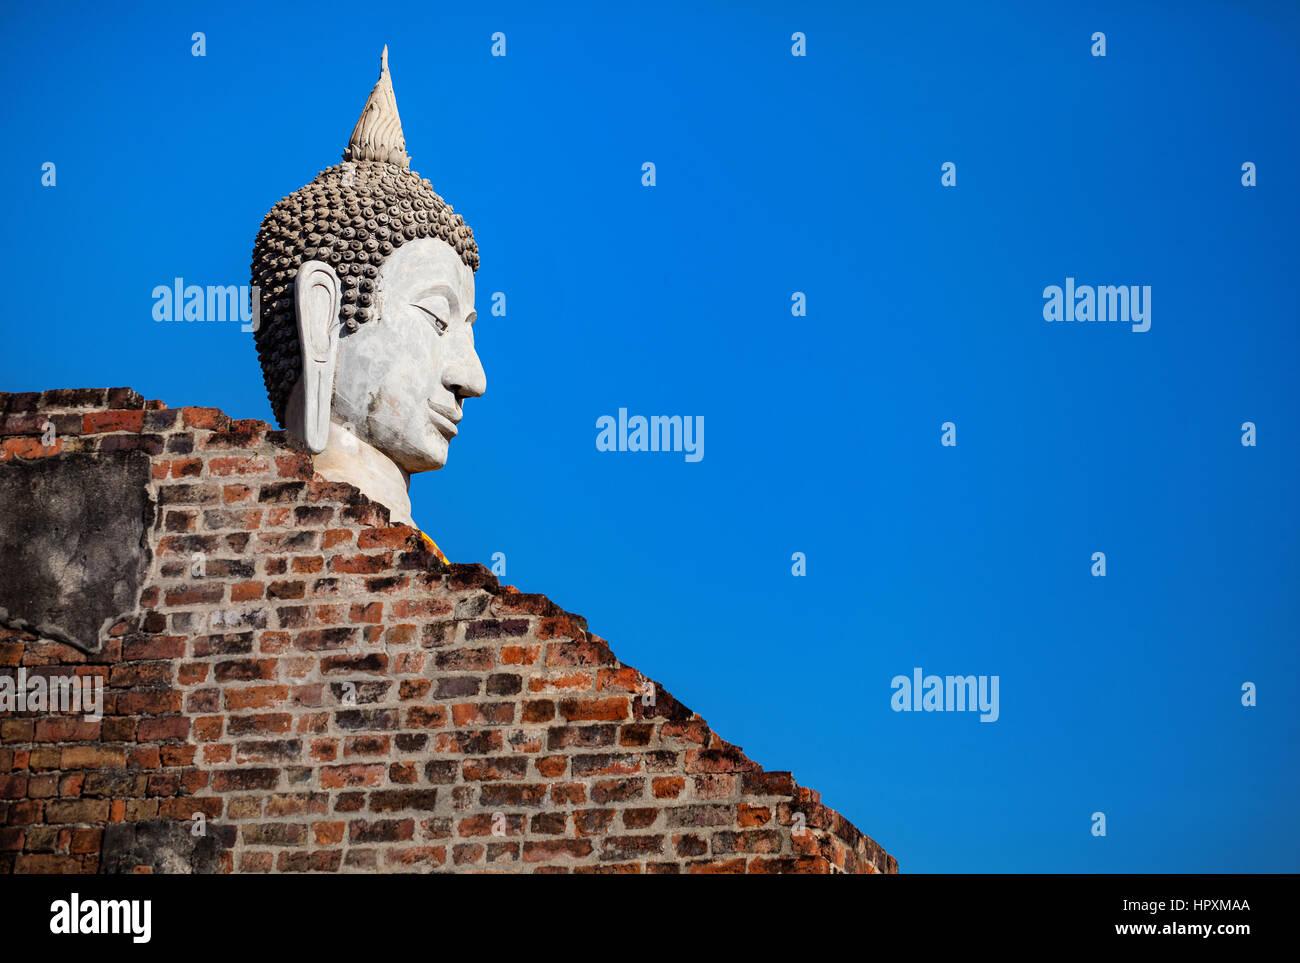 Statue du Grand Bouddha de Wat Yai Chai Mongkol monastère à ciel bleu à Ayuttaya, Thaïlande Photo Stock